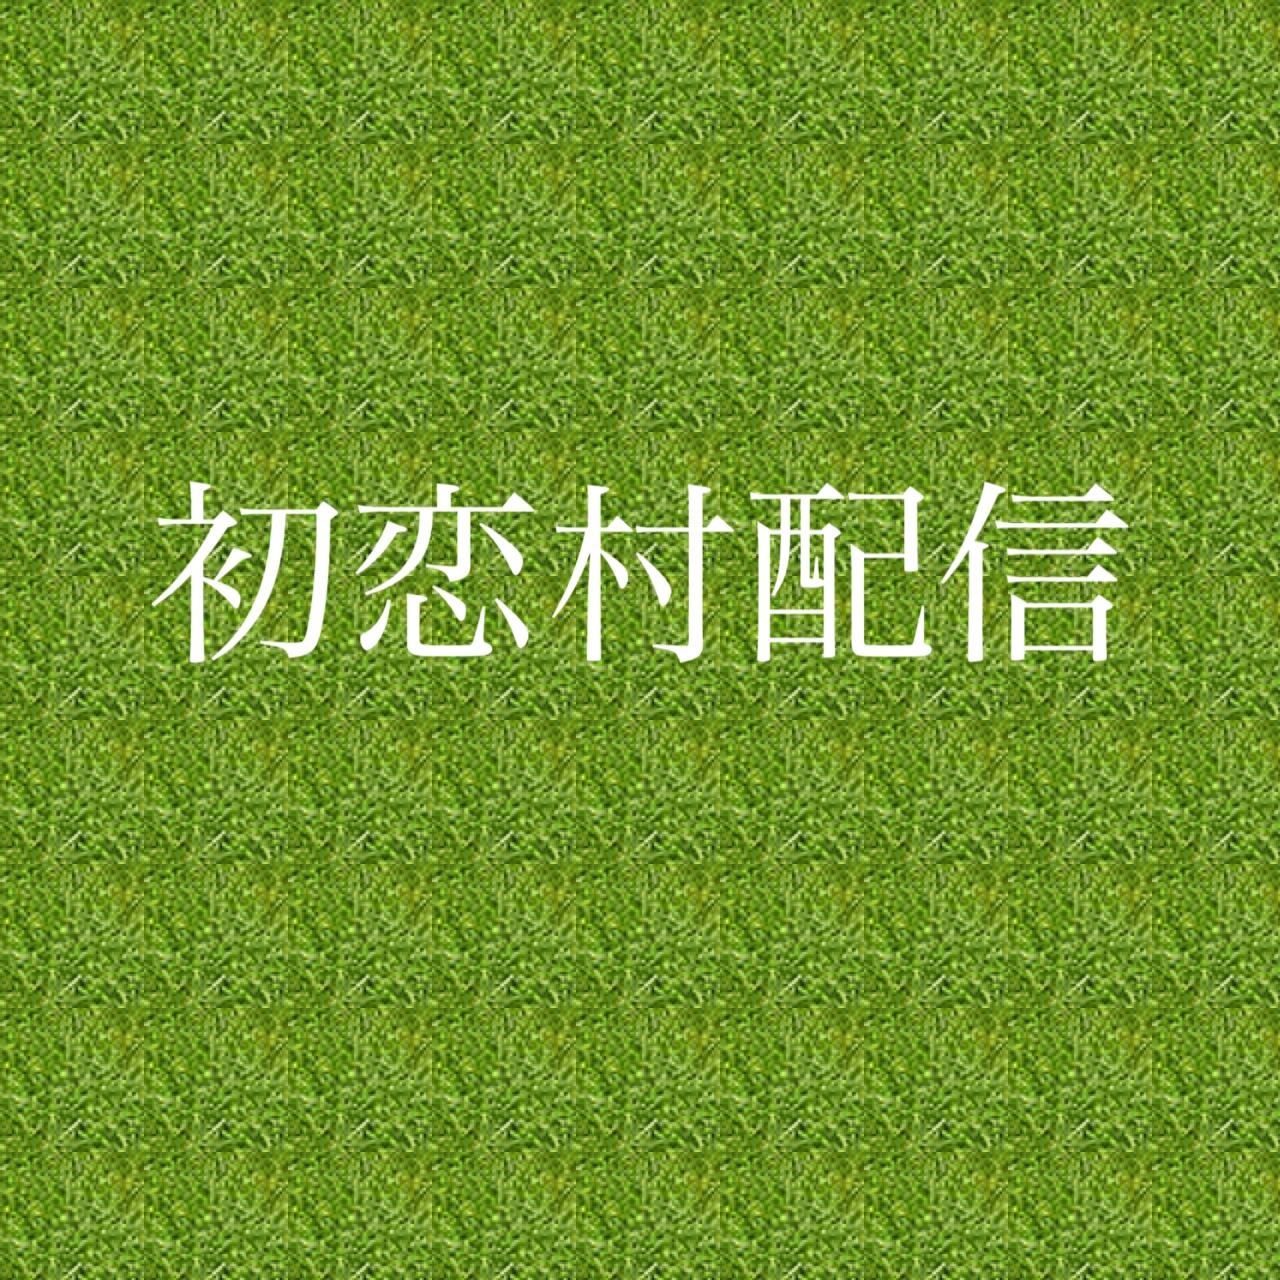 【配信】10月2日12:00〜初恋村Live